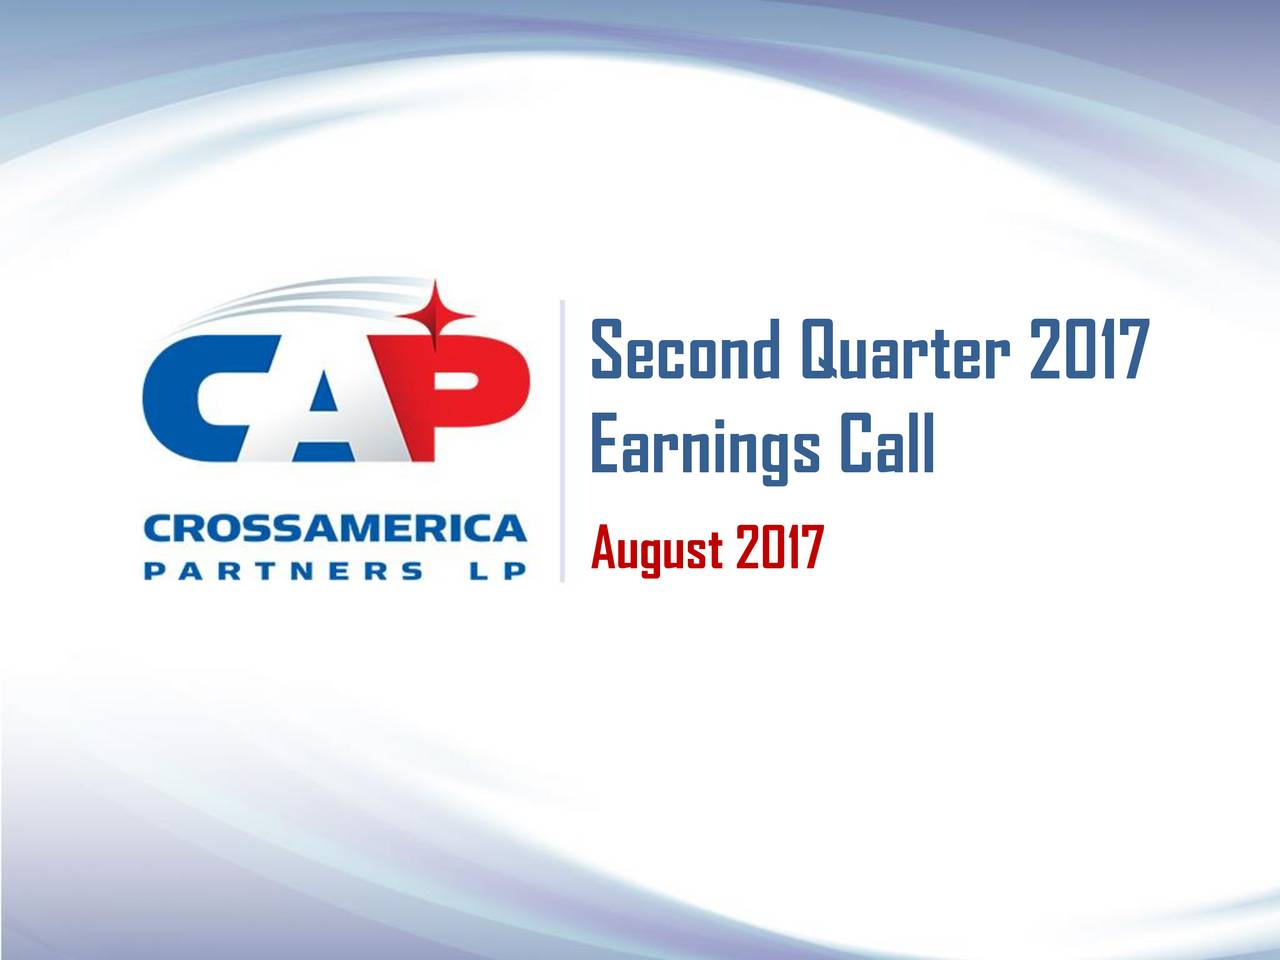 Earnings Call August 2017